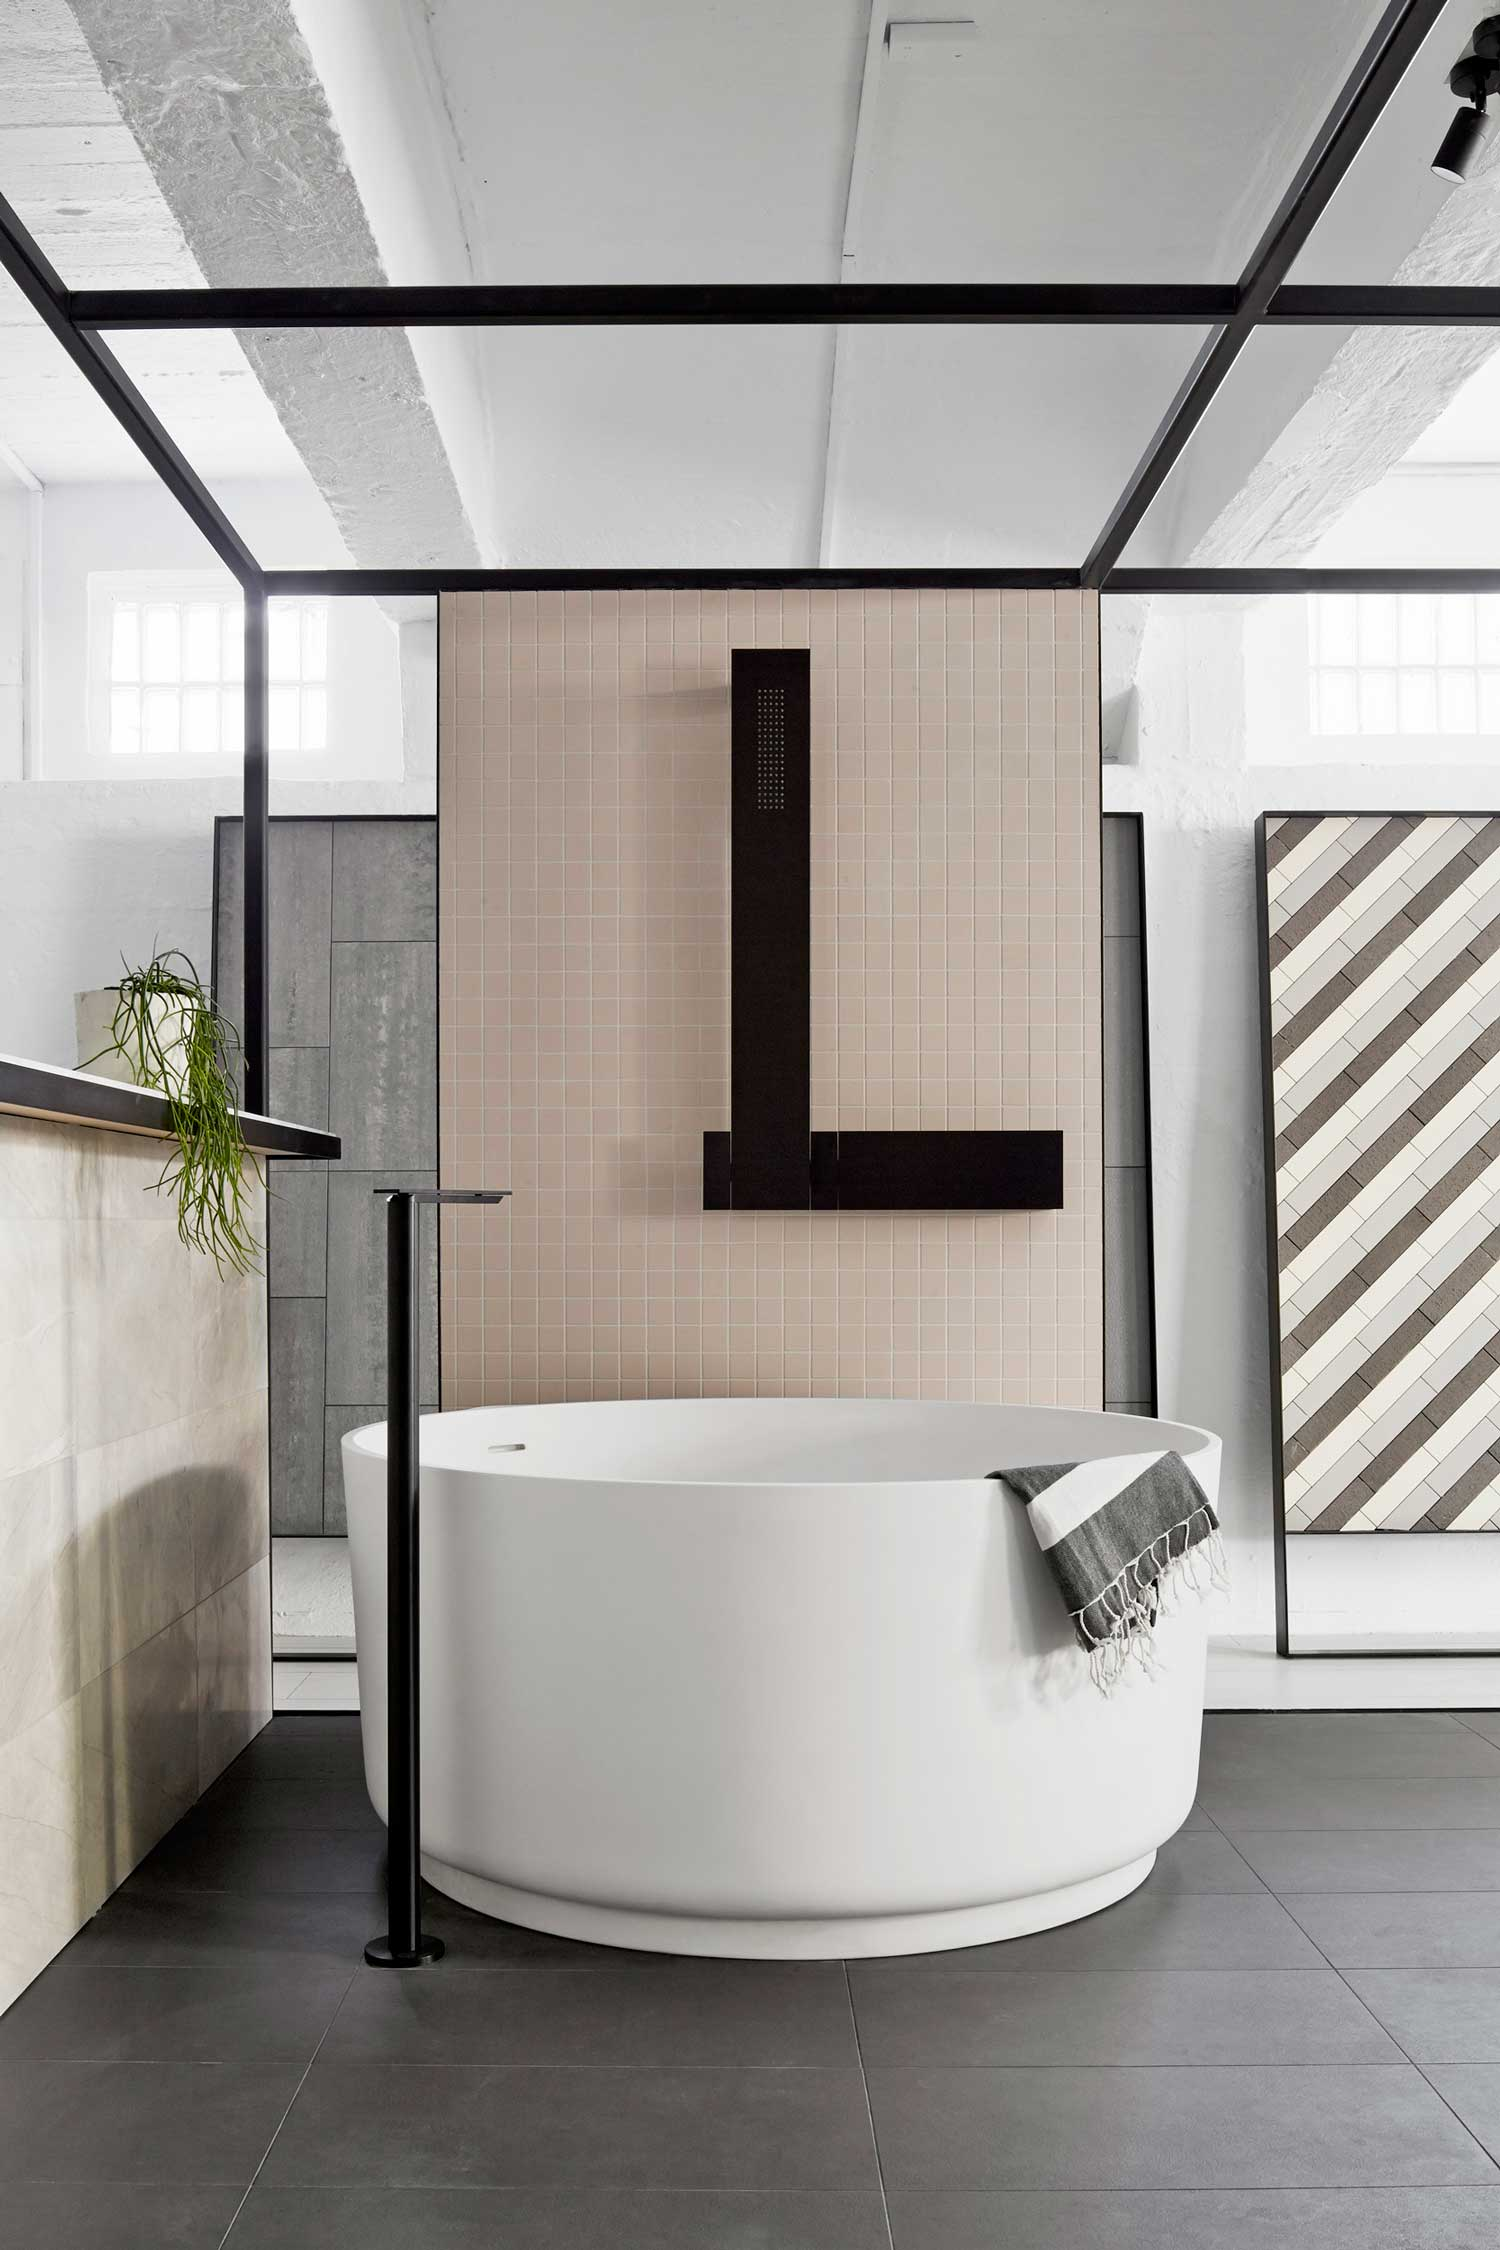 Brilliant Artedomus Melbourne Showroom By Studio You Me Interior Design Ideas Gentotryabchikinfo